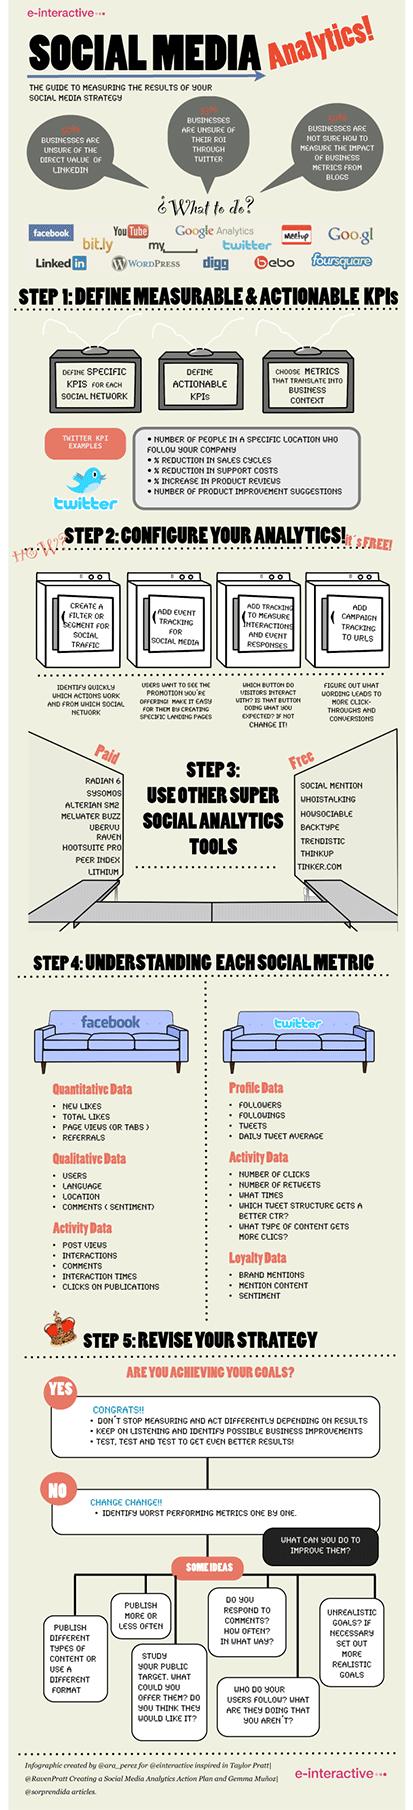 Infographic Source: Raven Blog